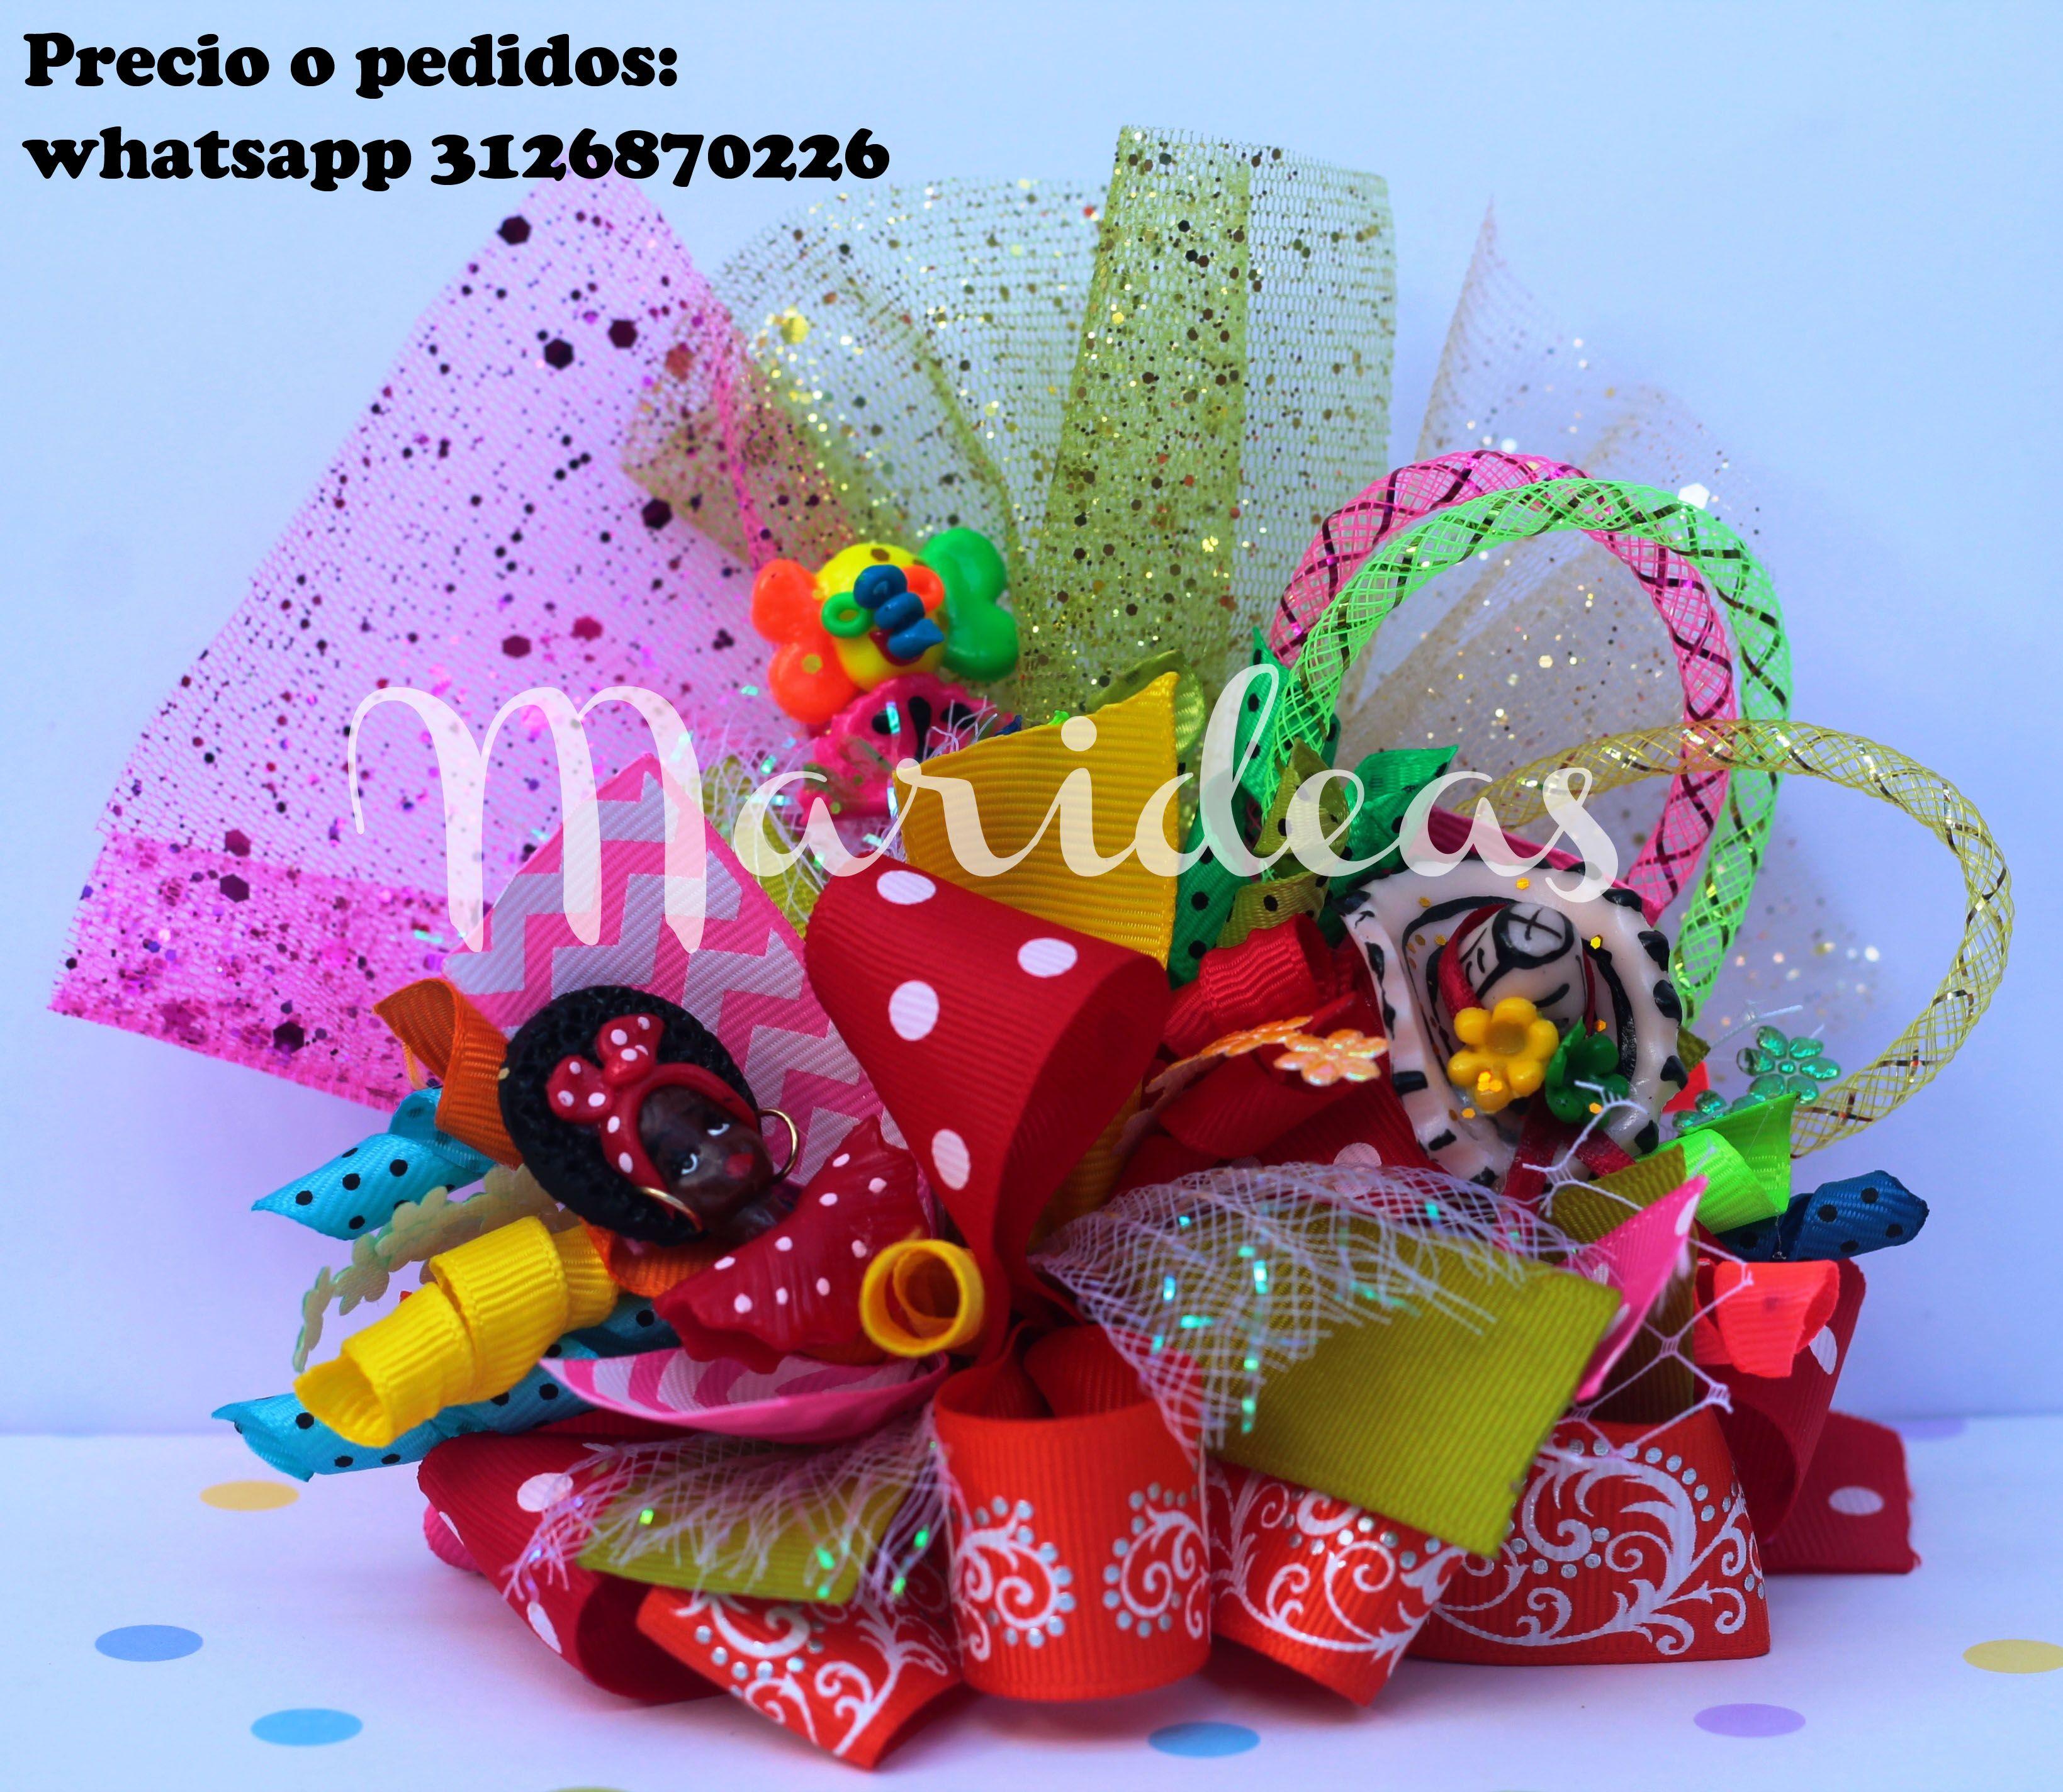 Moño Funky Carnaval de Barranquilla :: Marideas